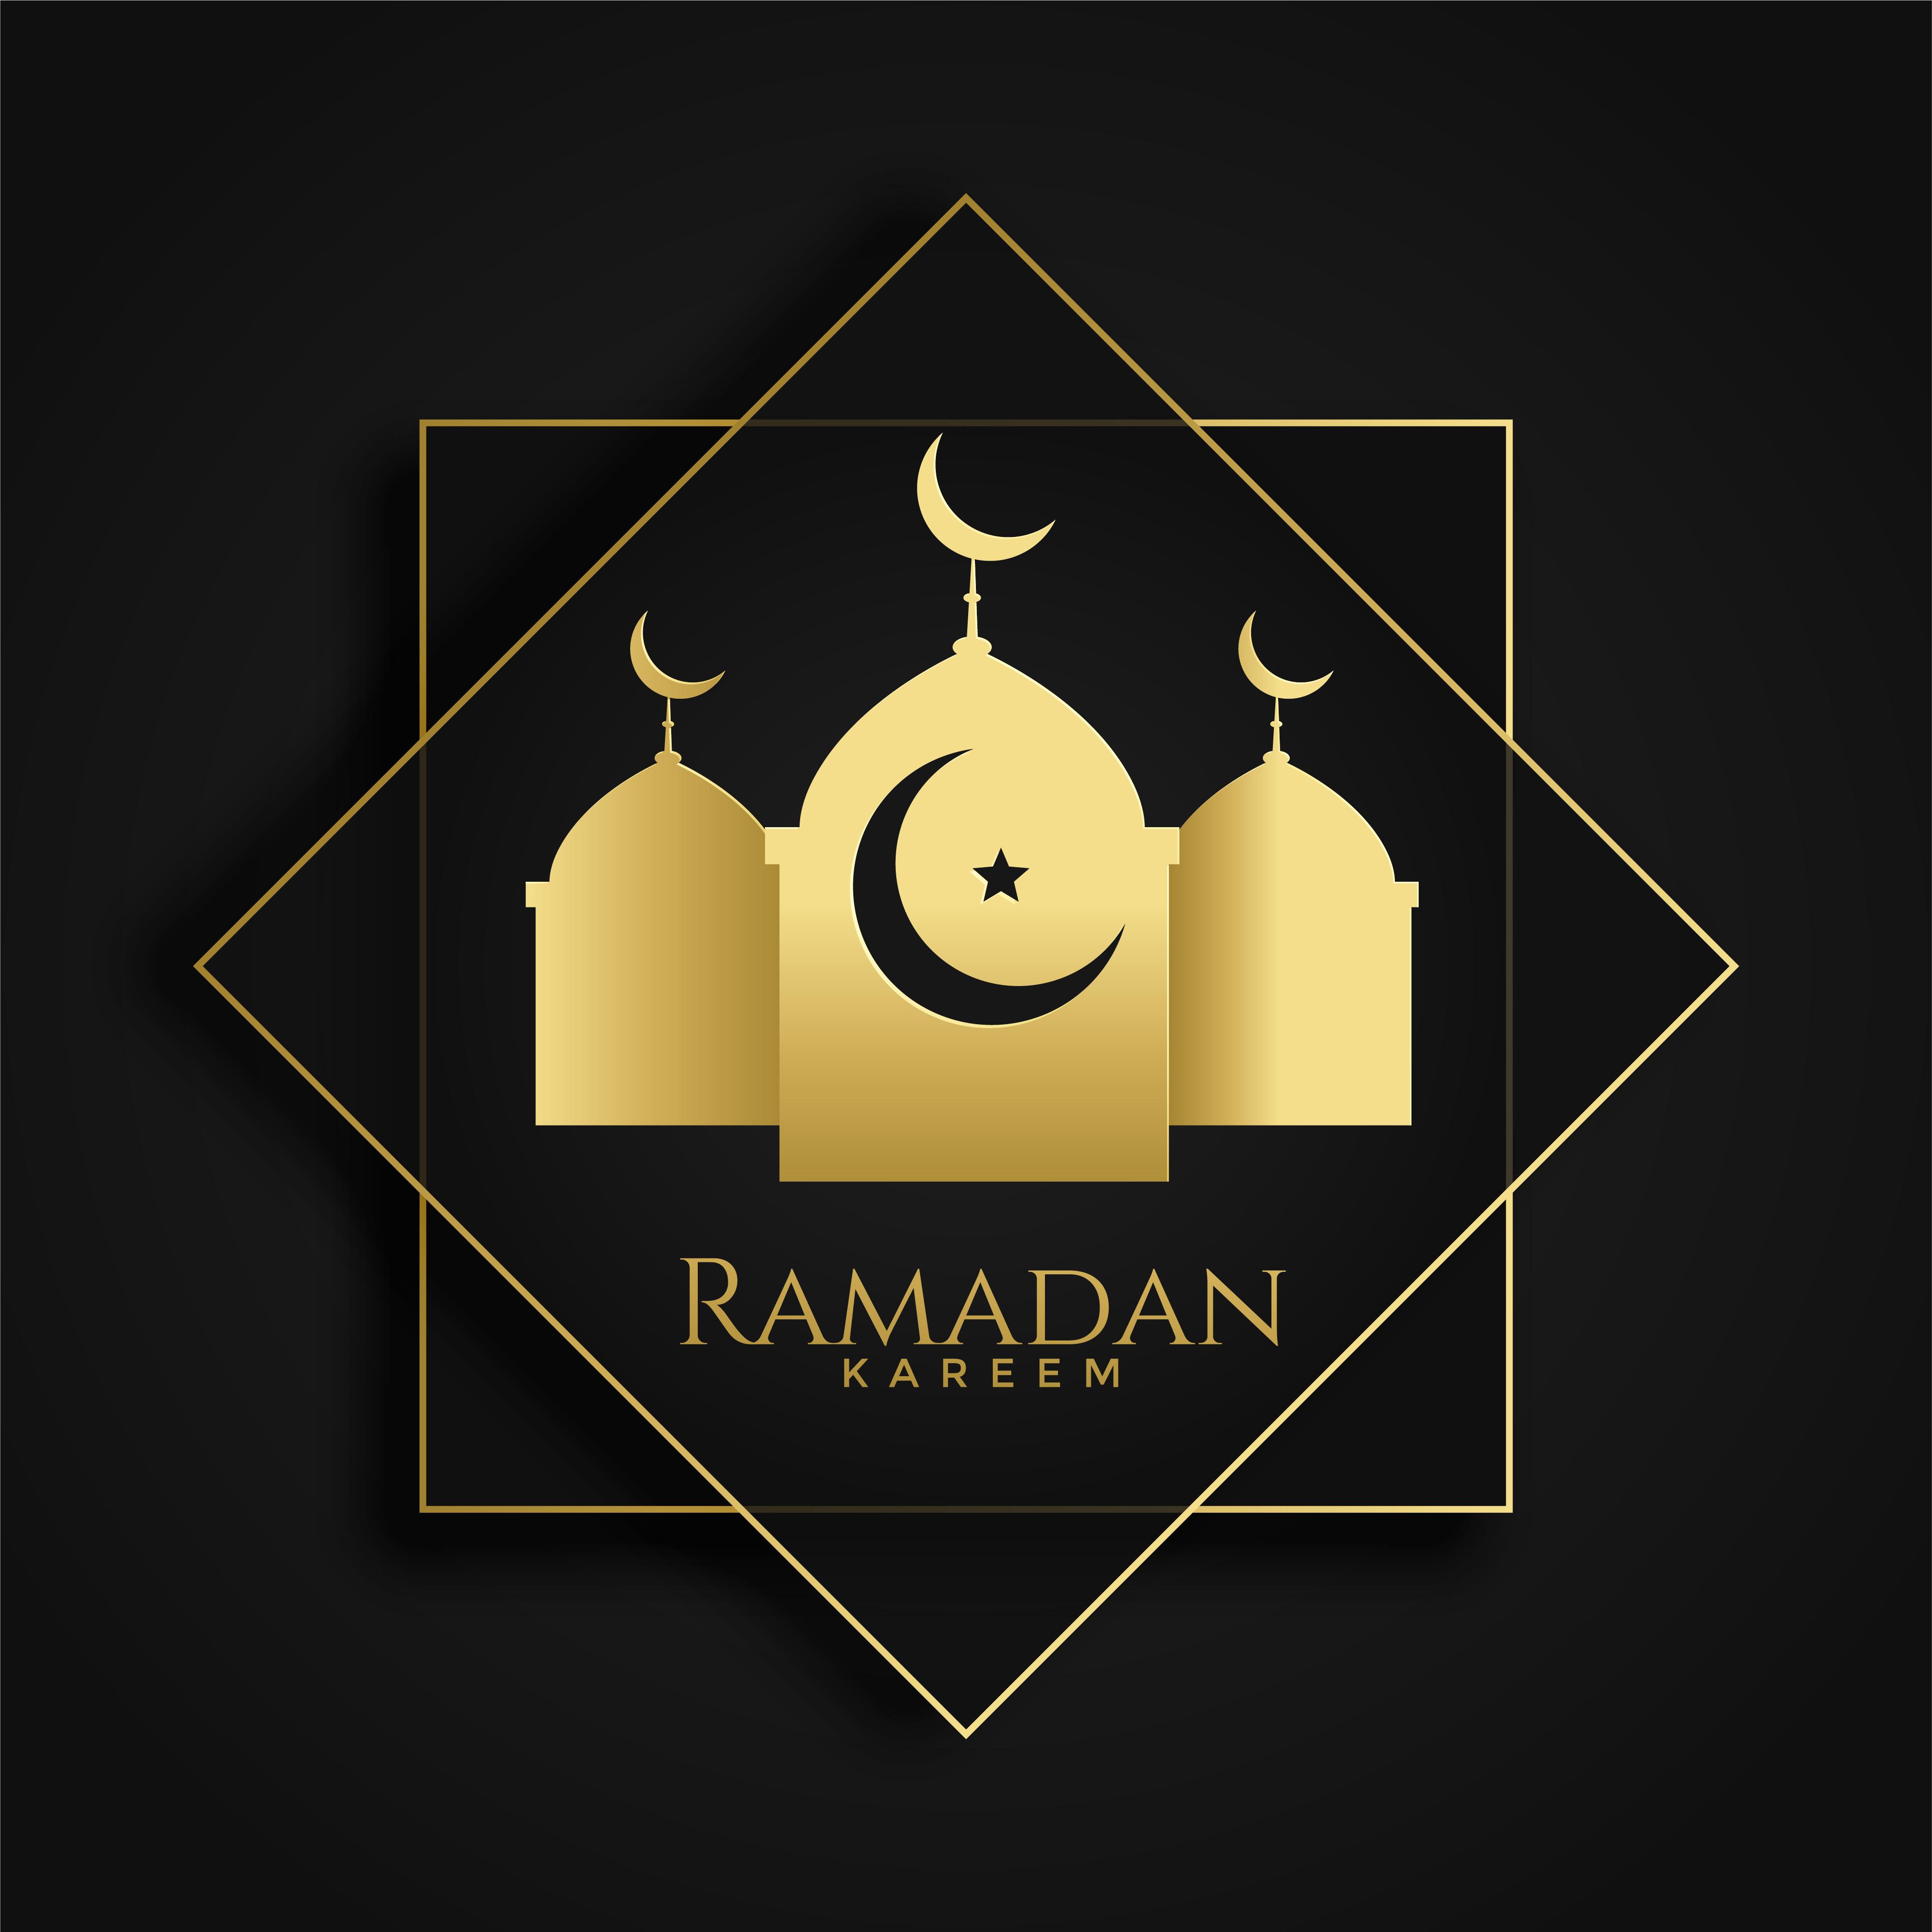 Ramadan Kareem Islamic Greeting With Mosque Silhouette Download